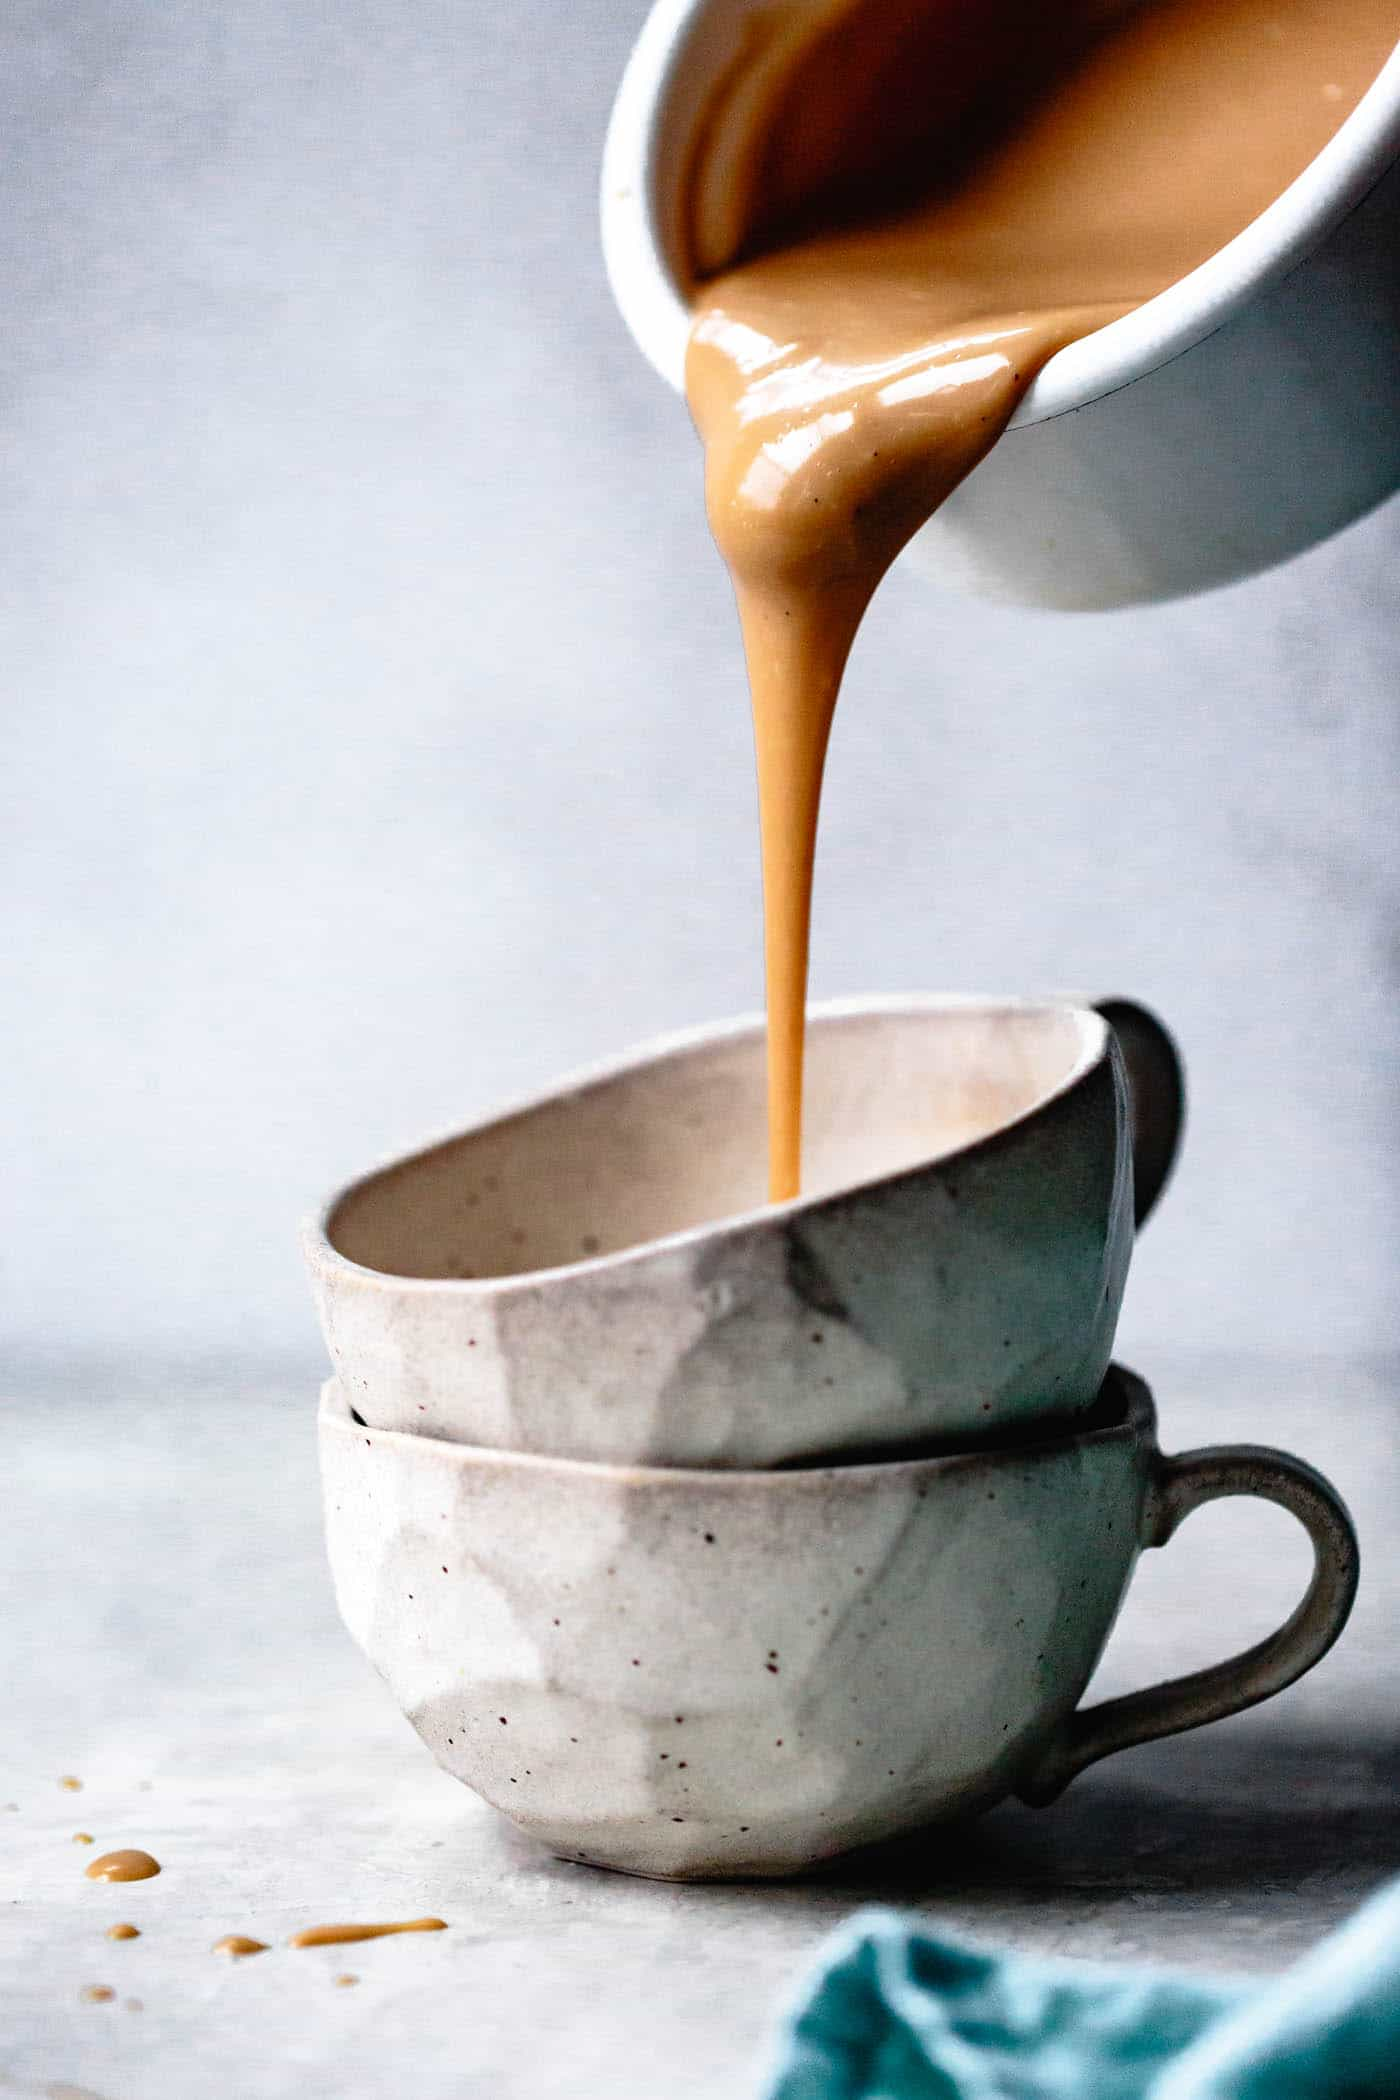 butterscotch pudding recipe (no eggs) pouring into mugs to set